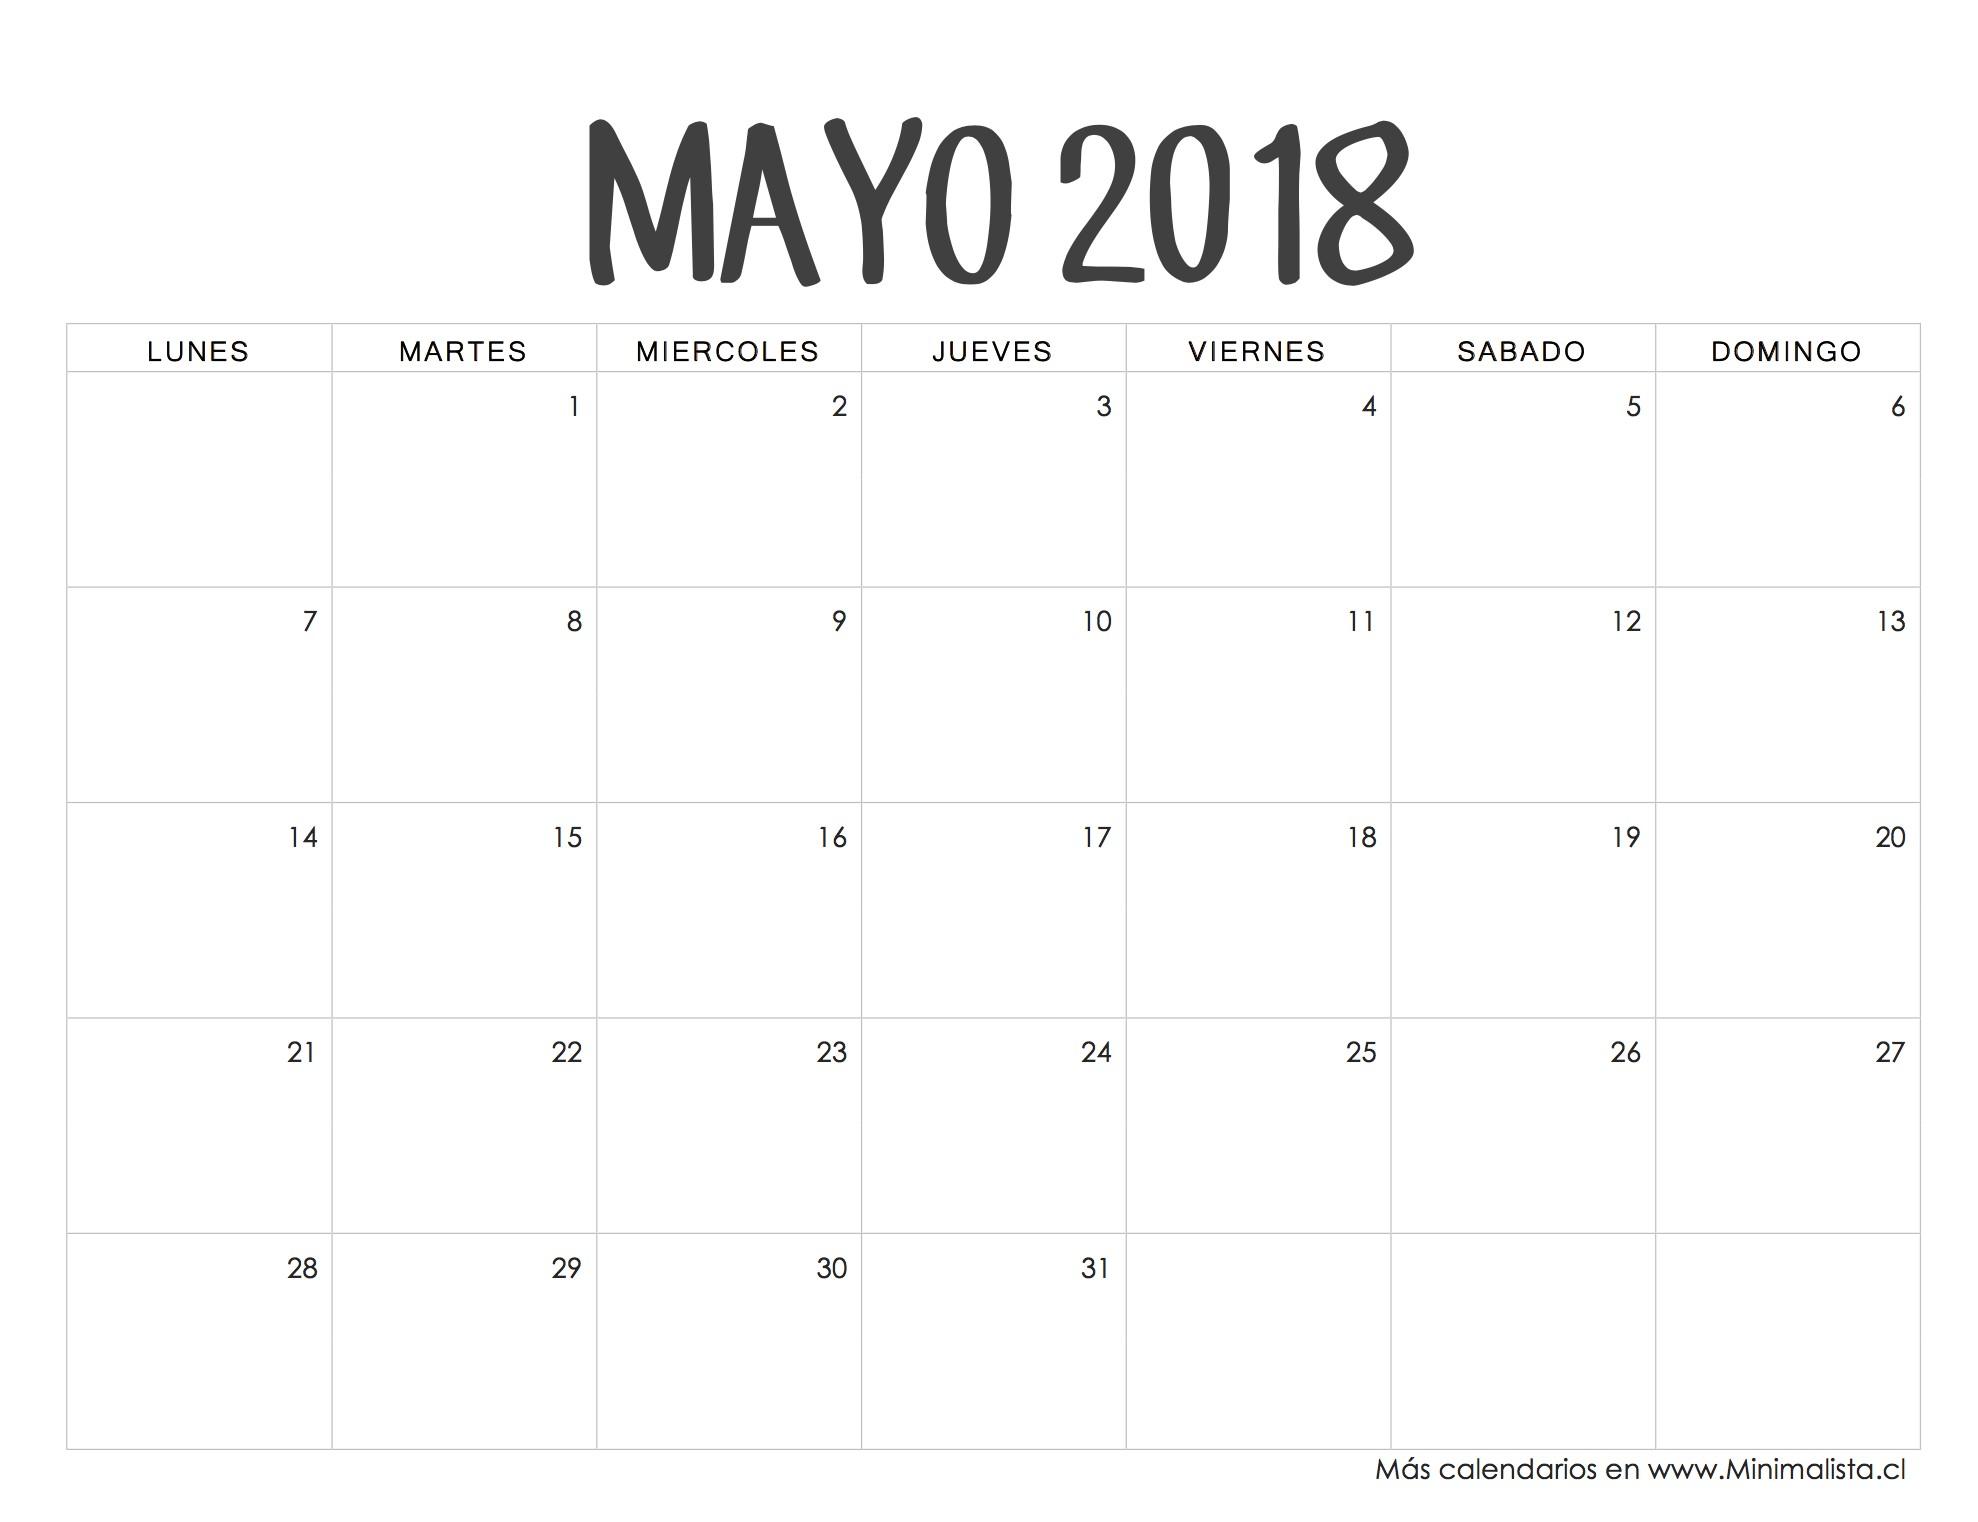 Calendario Semanal Para Imprimir 2017 Más Actual Calendario Mayo 2018 Calendario 2017 Pinterest Of Calendario Semanal Para Imprimir 2017 Mejores Y Más Novedosos Agenda A5